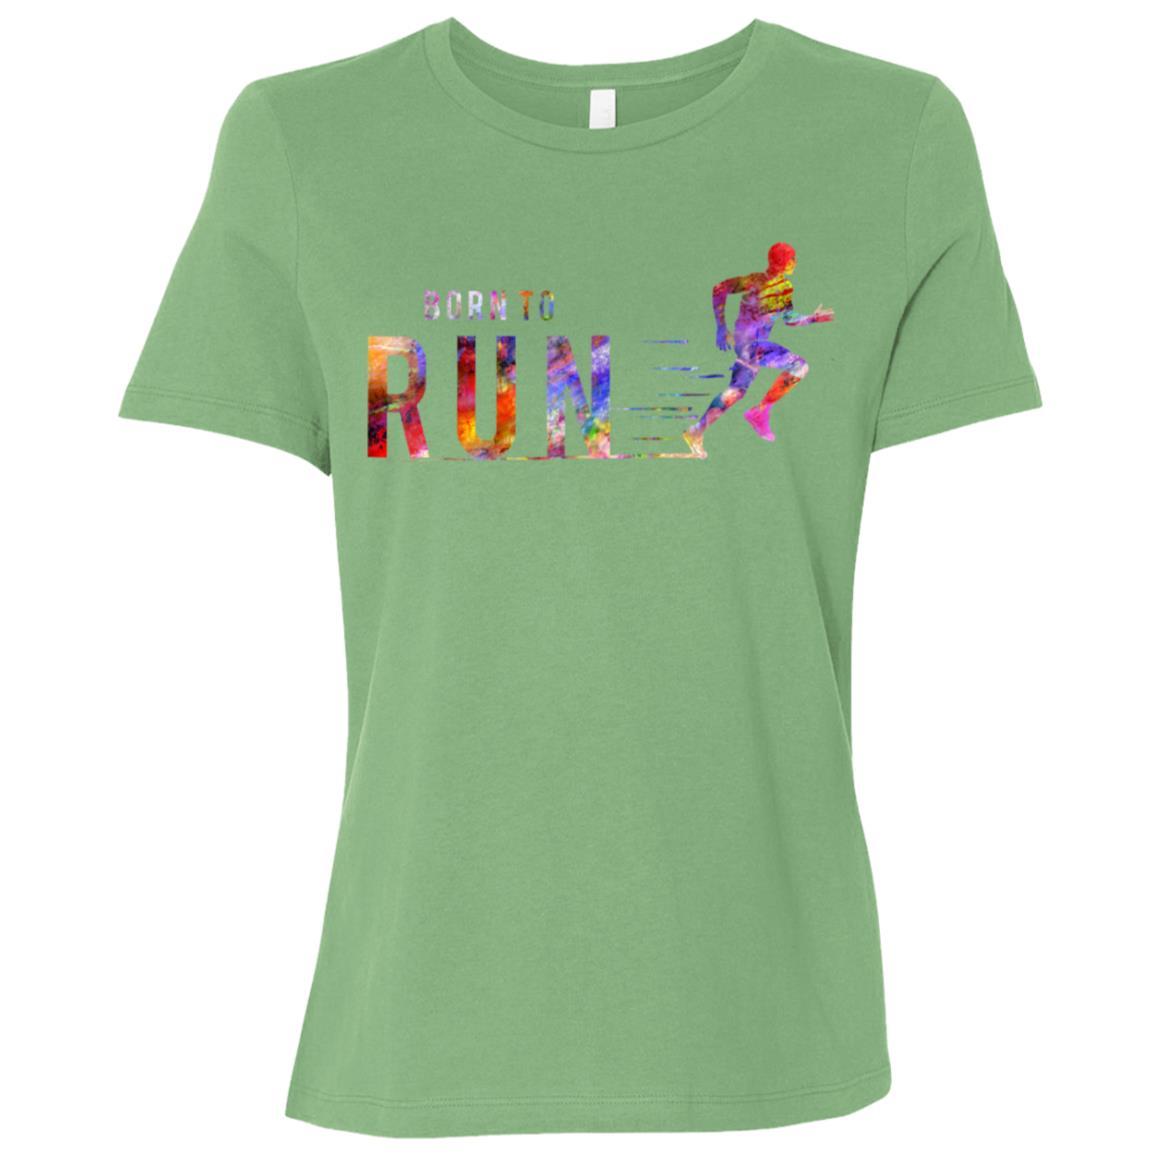 Born to Run Marathon Run Sports Colorful Women Short Sleeve T-Shirt